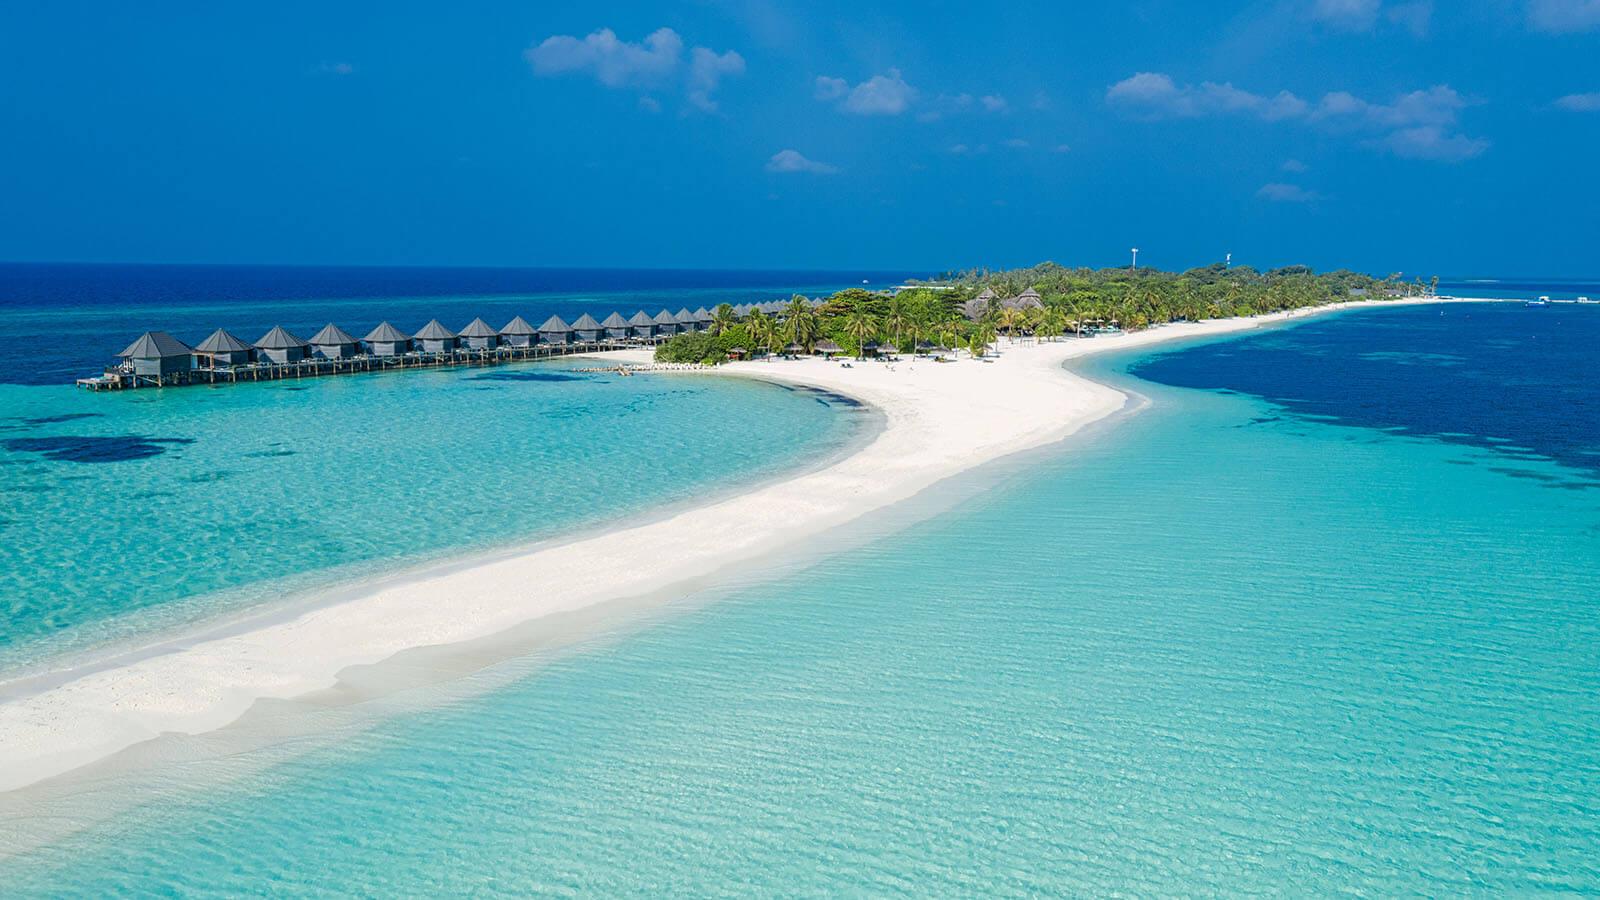 Eid in Kuredu Island Maldive Holiday Travel & Tour Package